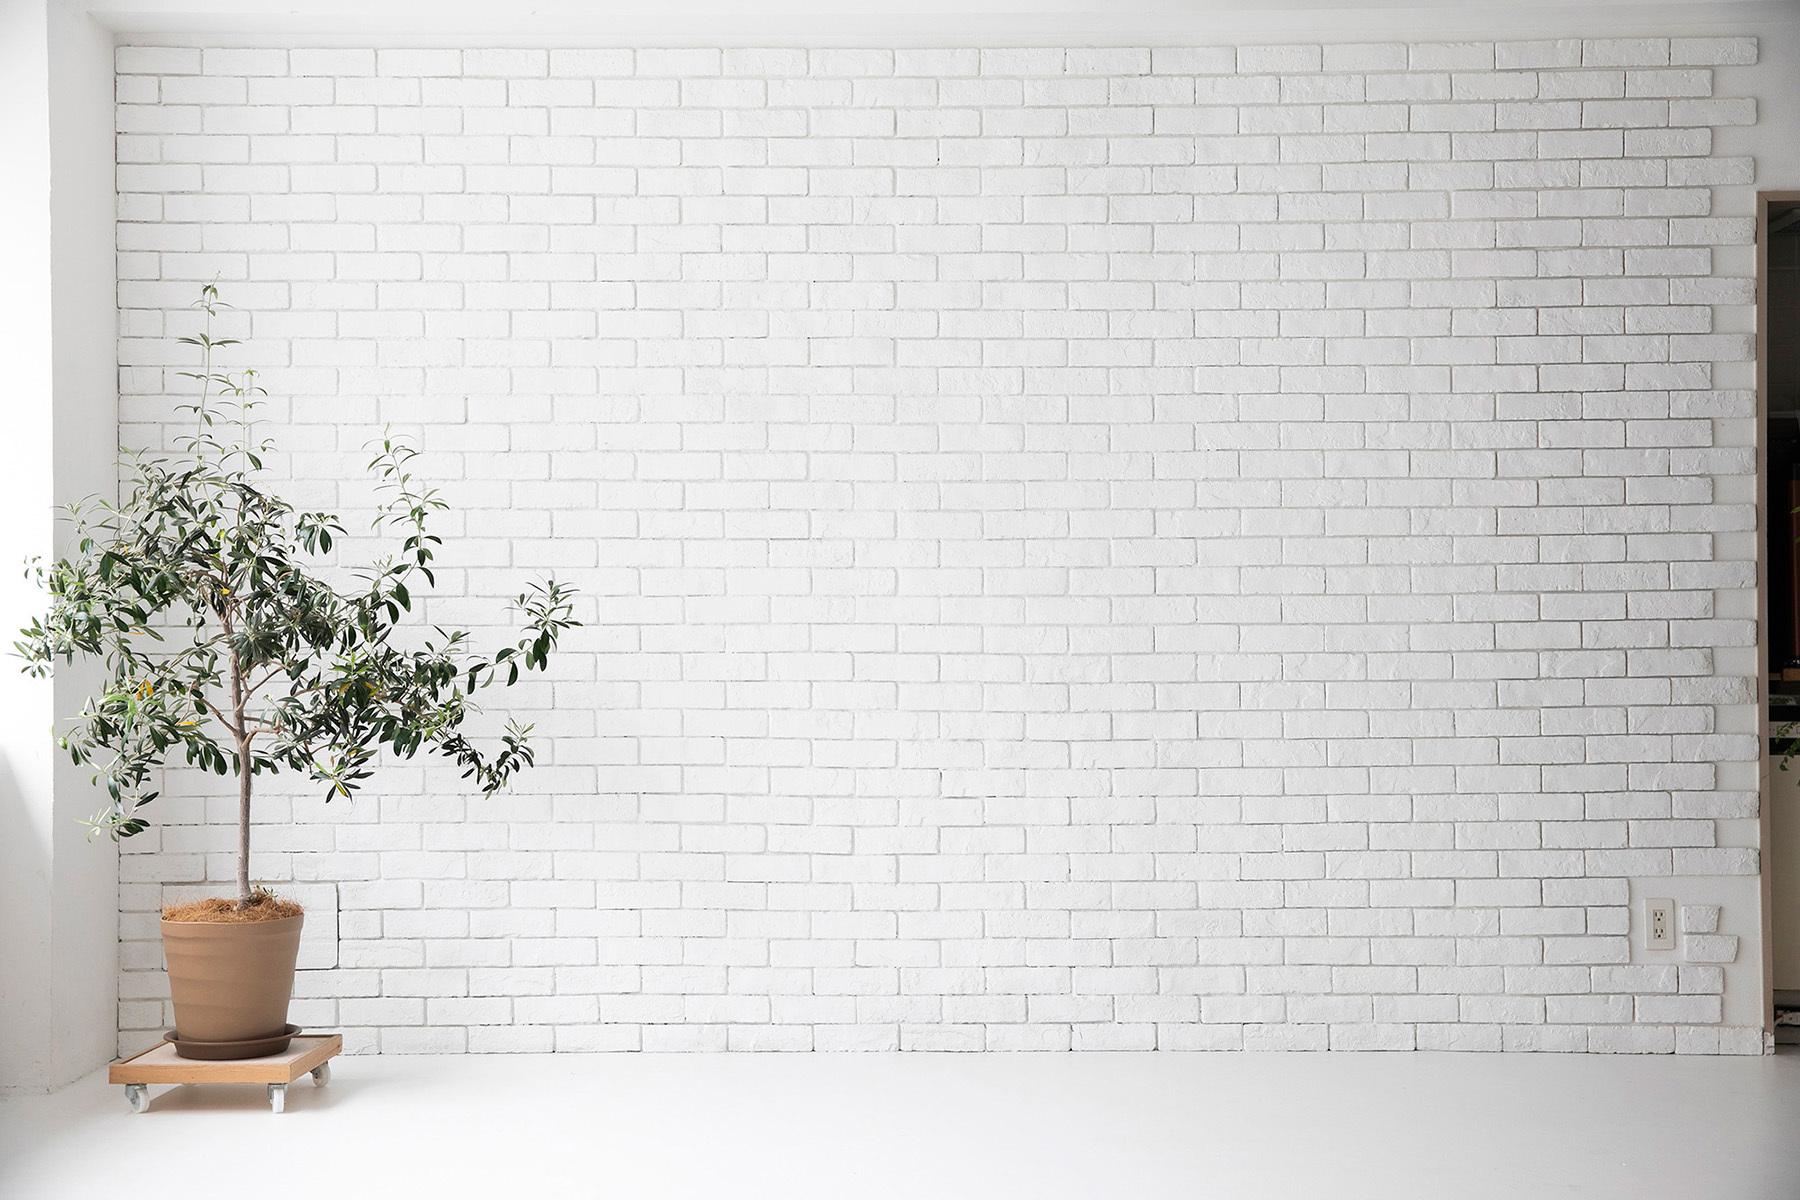 studio Mired(スタジオ ミレッド)南向きの窓